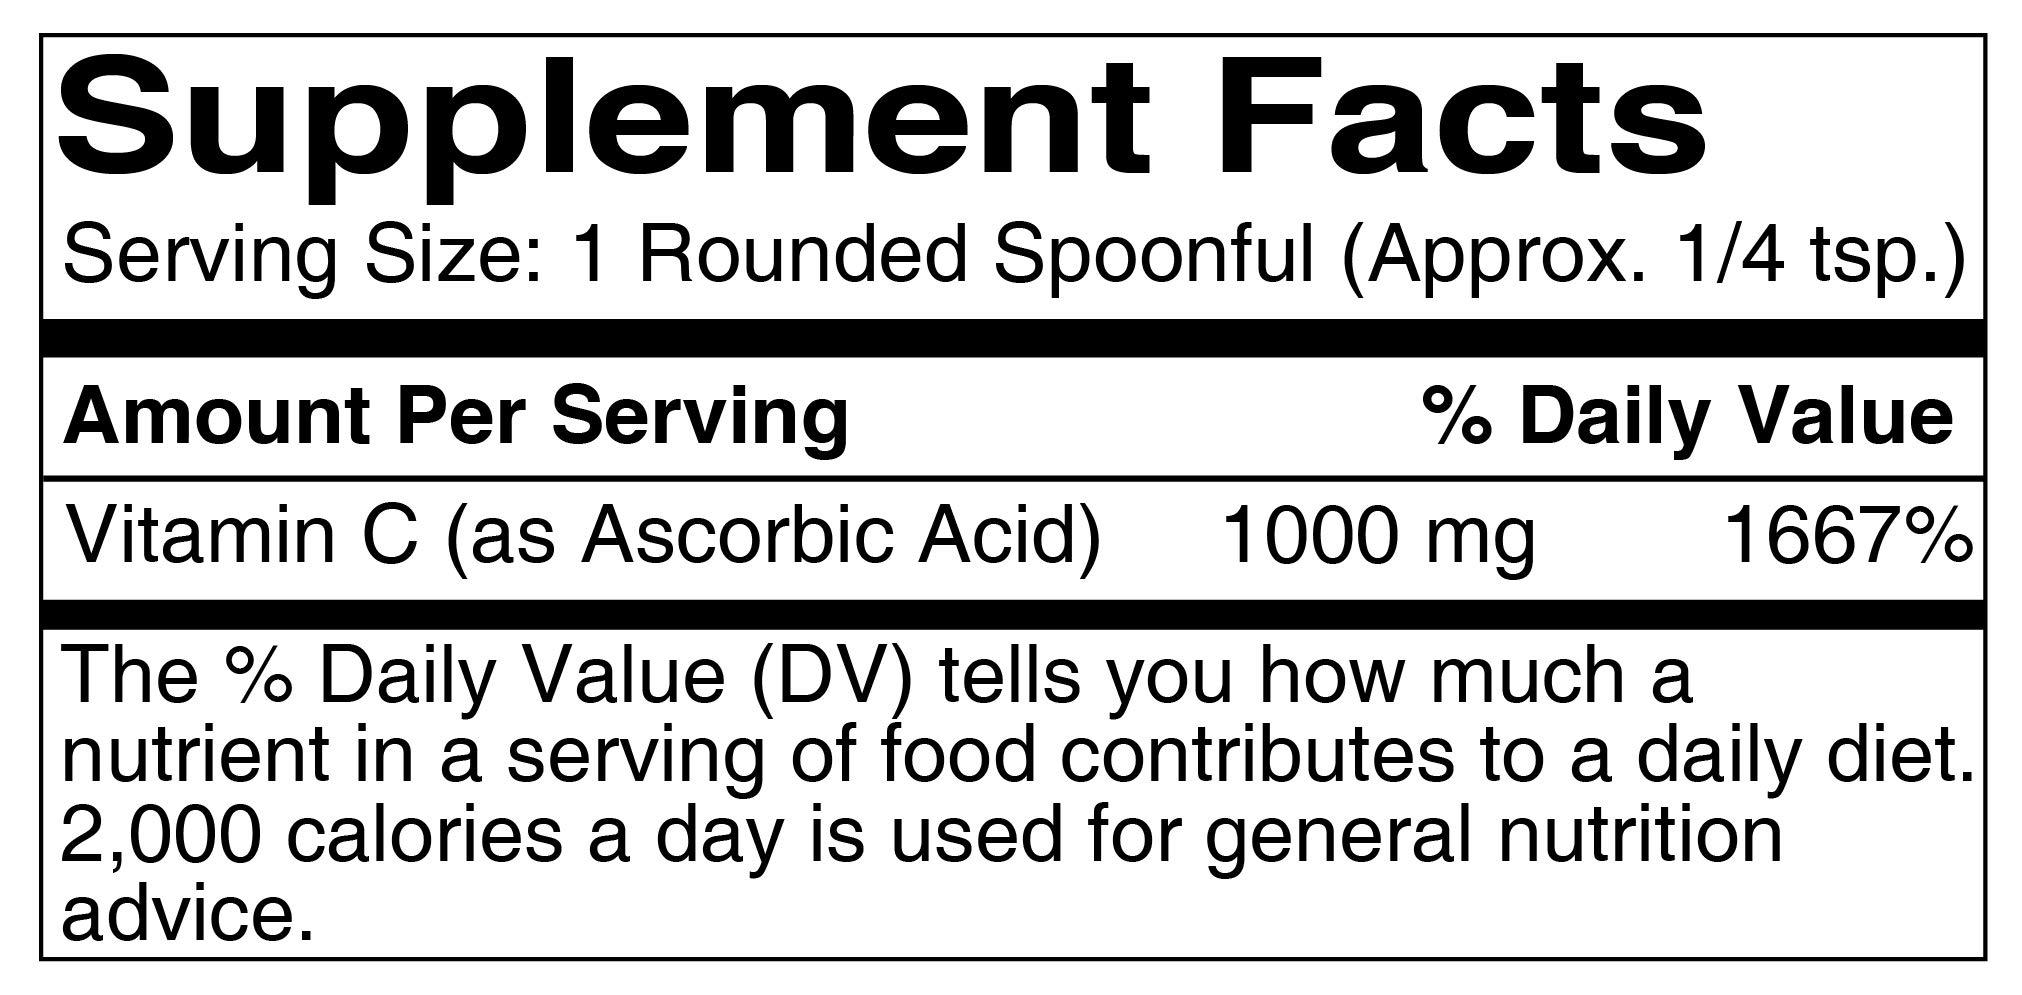 Vitamin C Powder (1 lb.) by Pure Organic Ingredients, Eco-Friendly Packaging, L-Ascorbic Acid, Antioxidant, Boost Immune System, DIY Skin Care